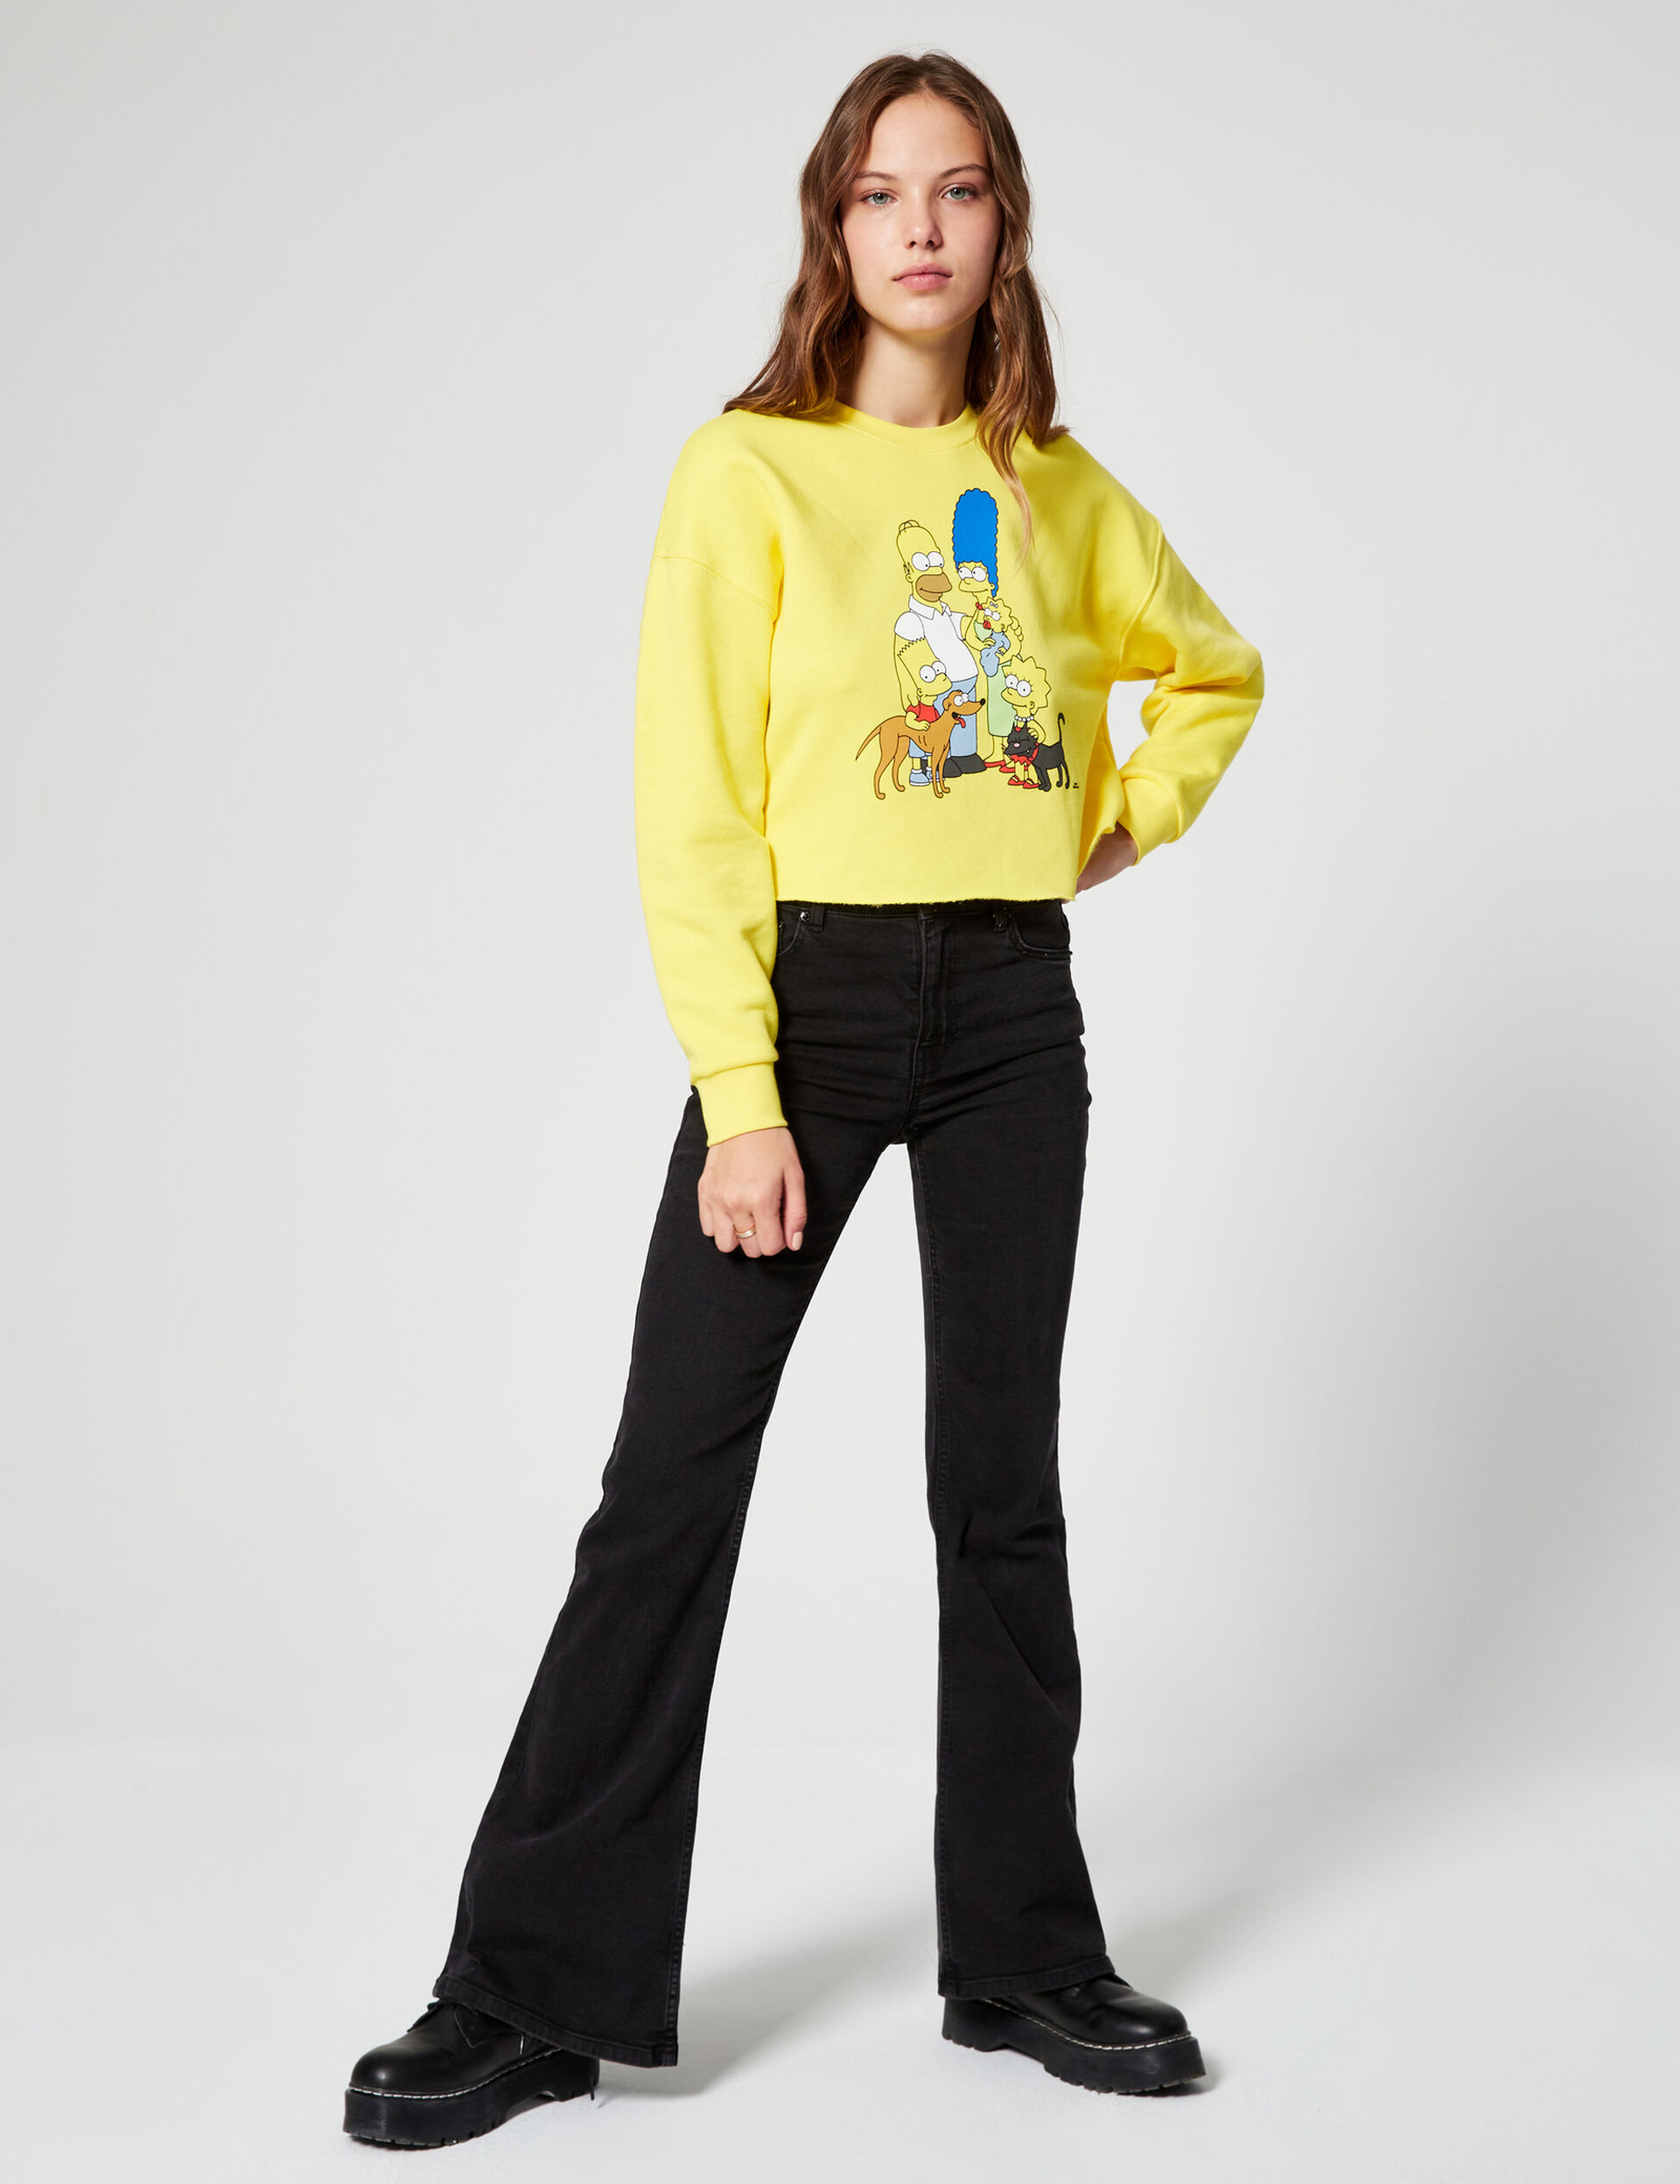 The Simpsons cropped sweatshirt